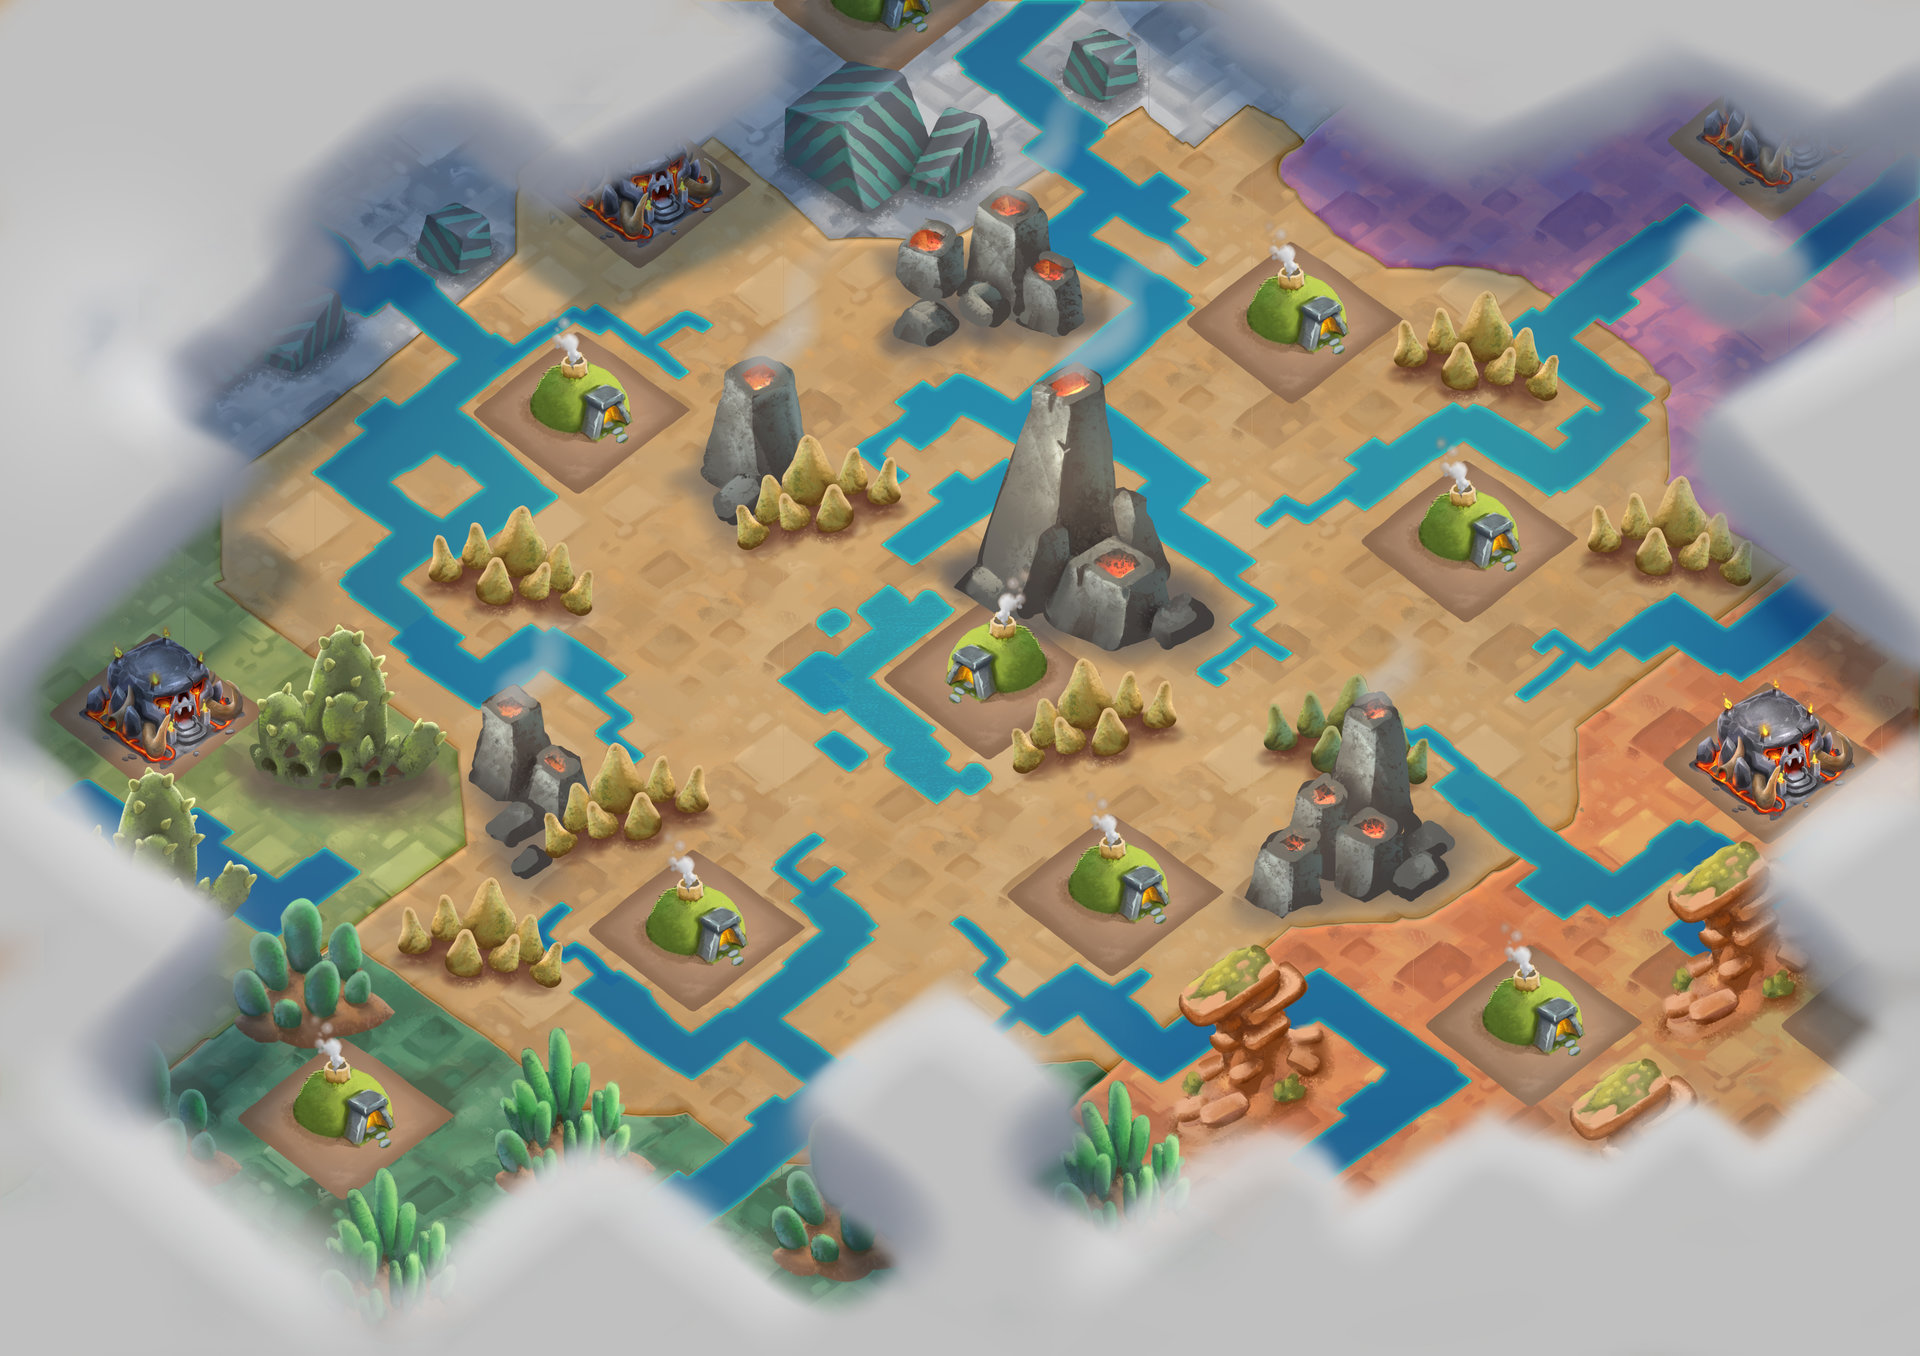 Loic bramoulle fq recherches map world liok 002 noicons